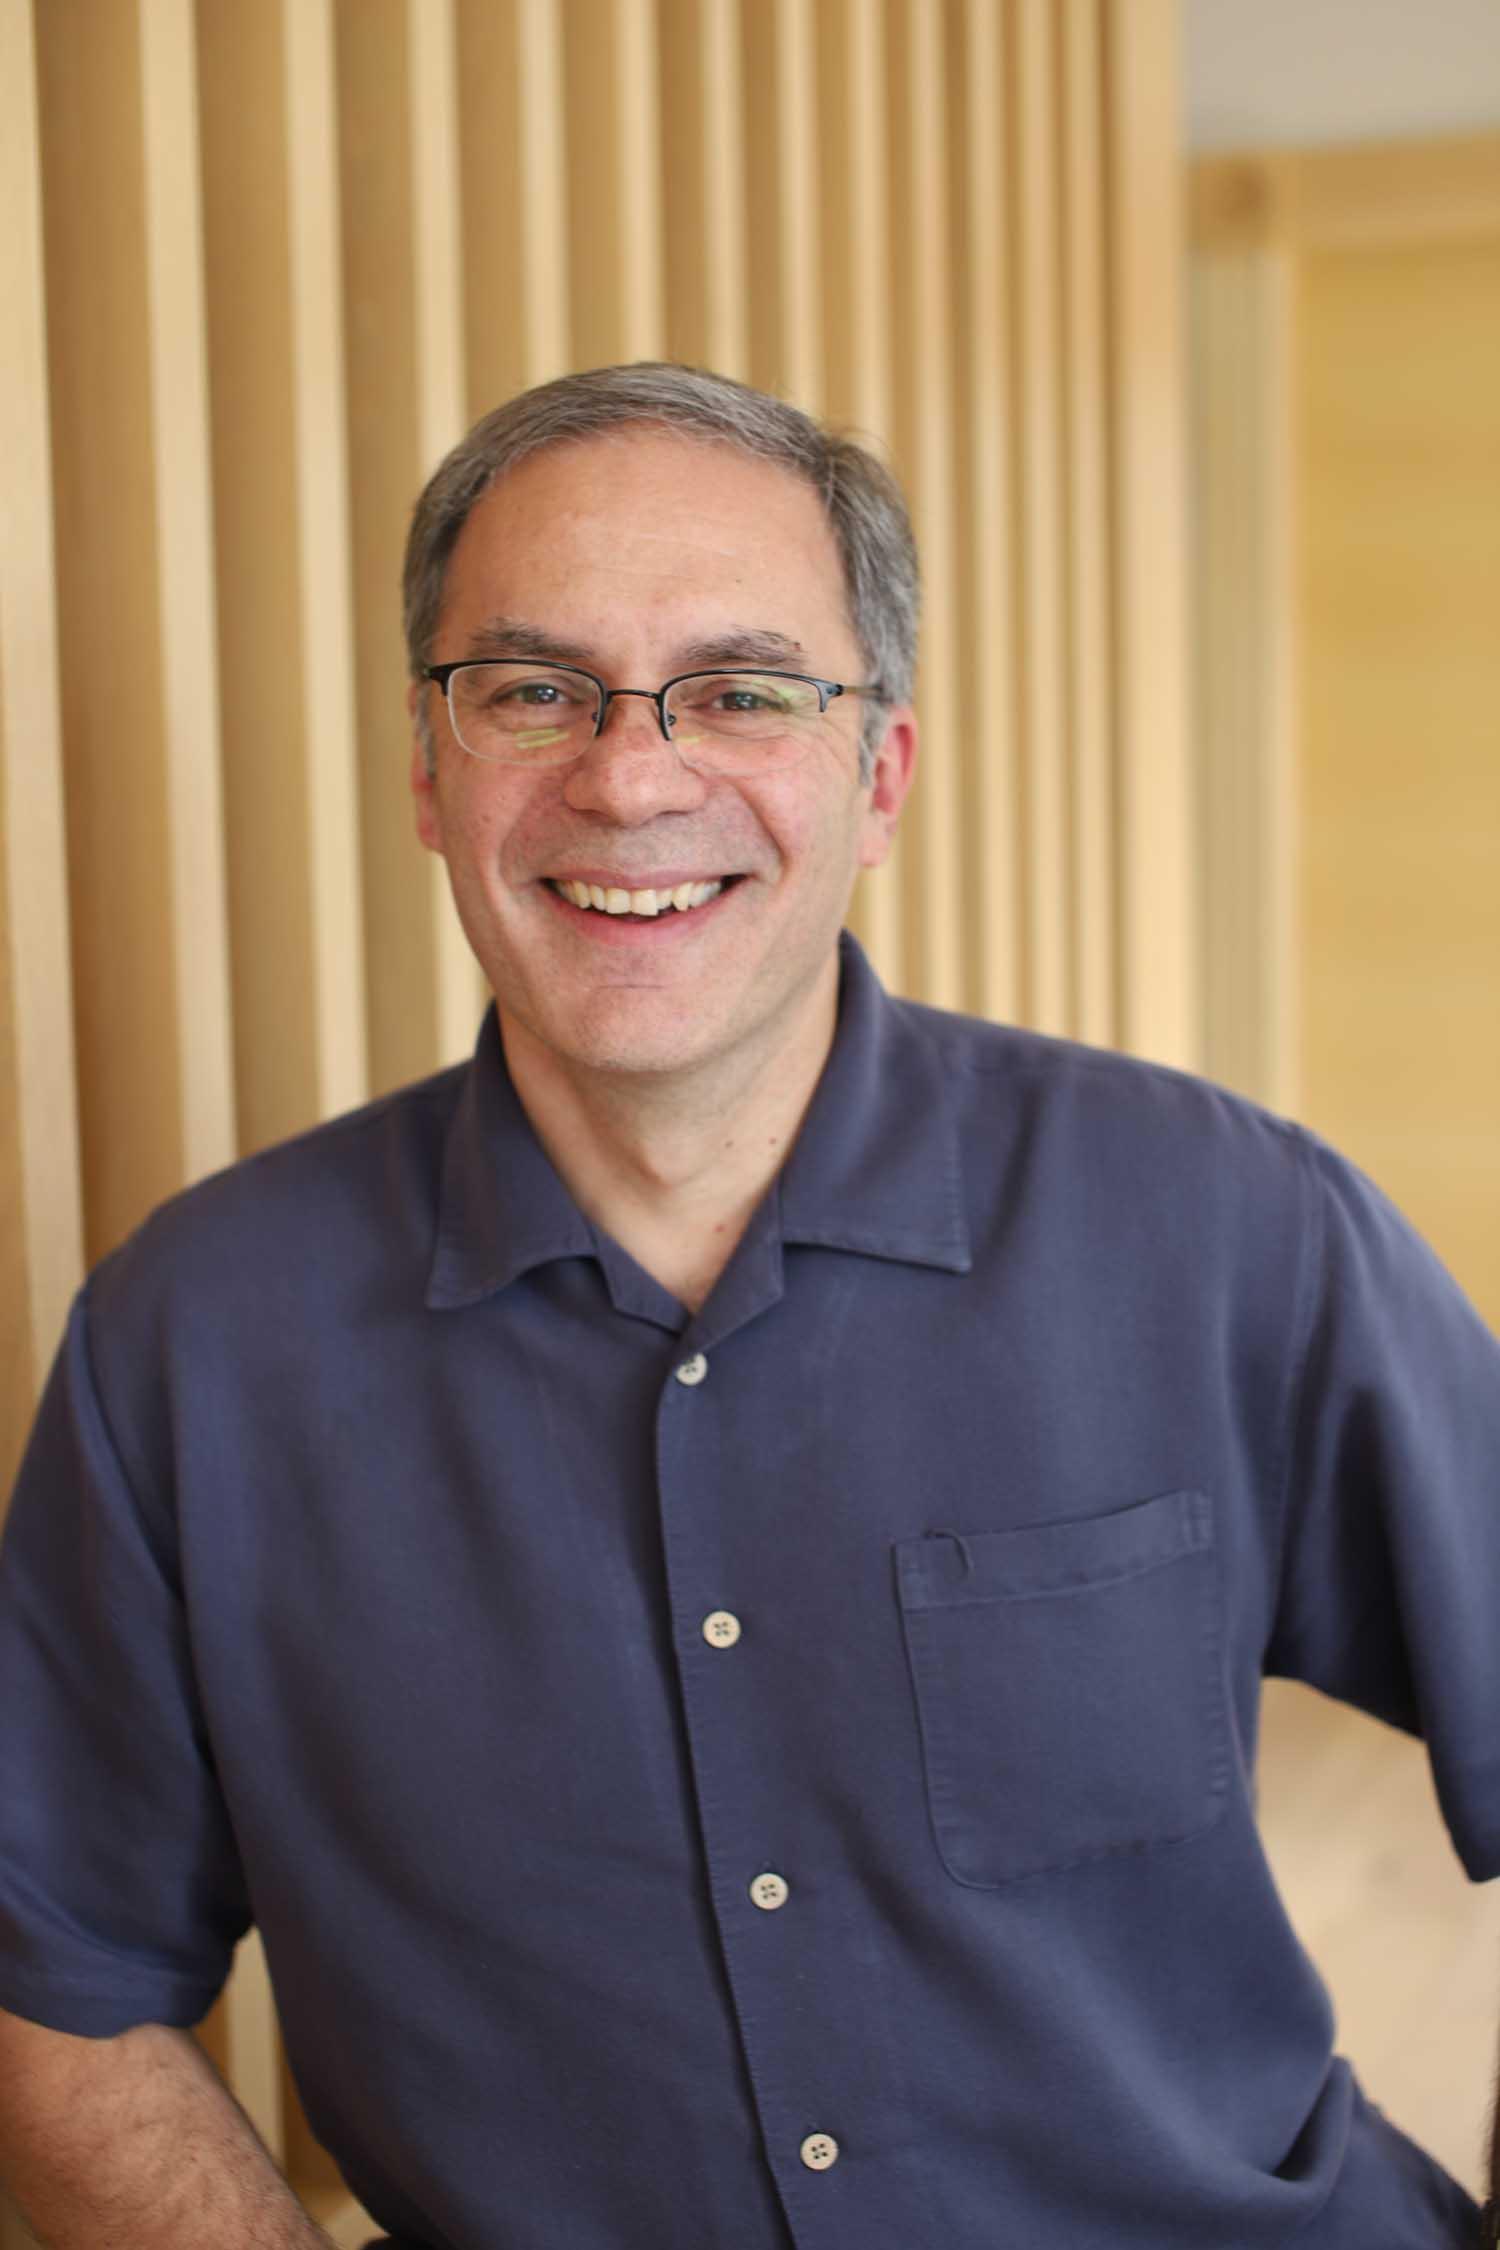 Dr. David Beeman, PhD